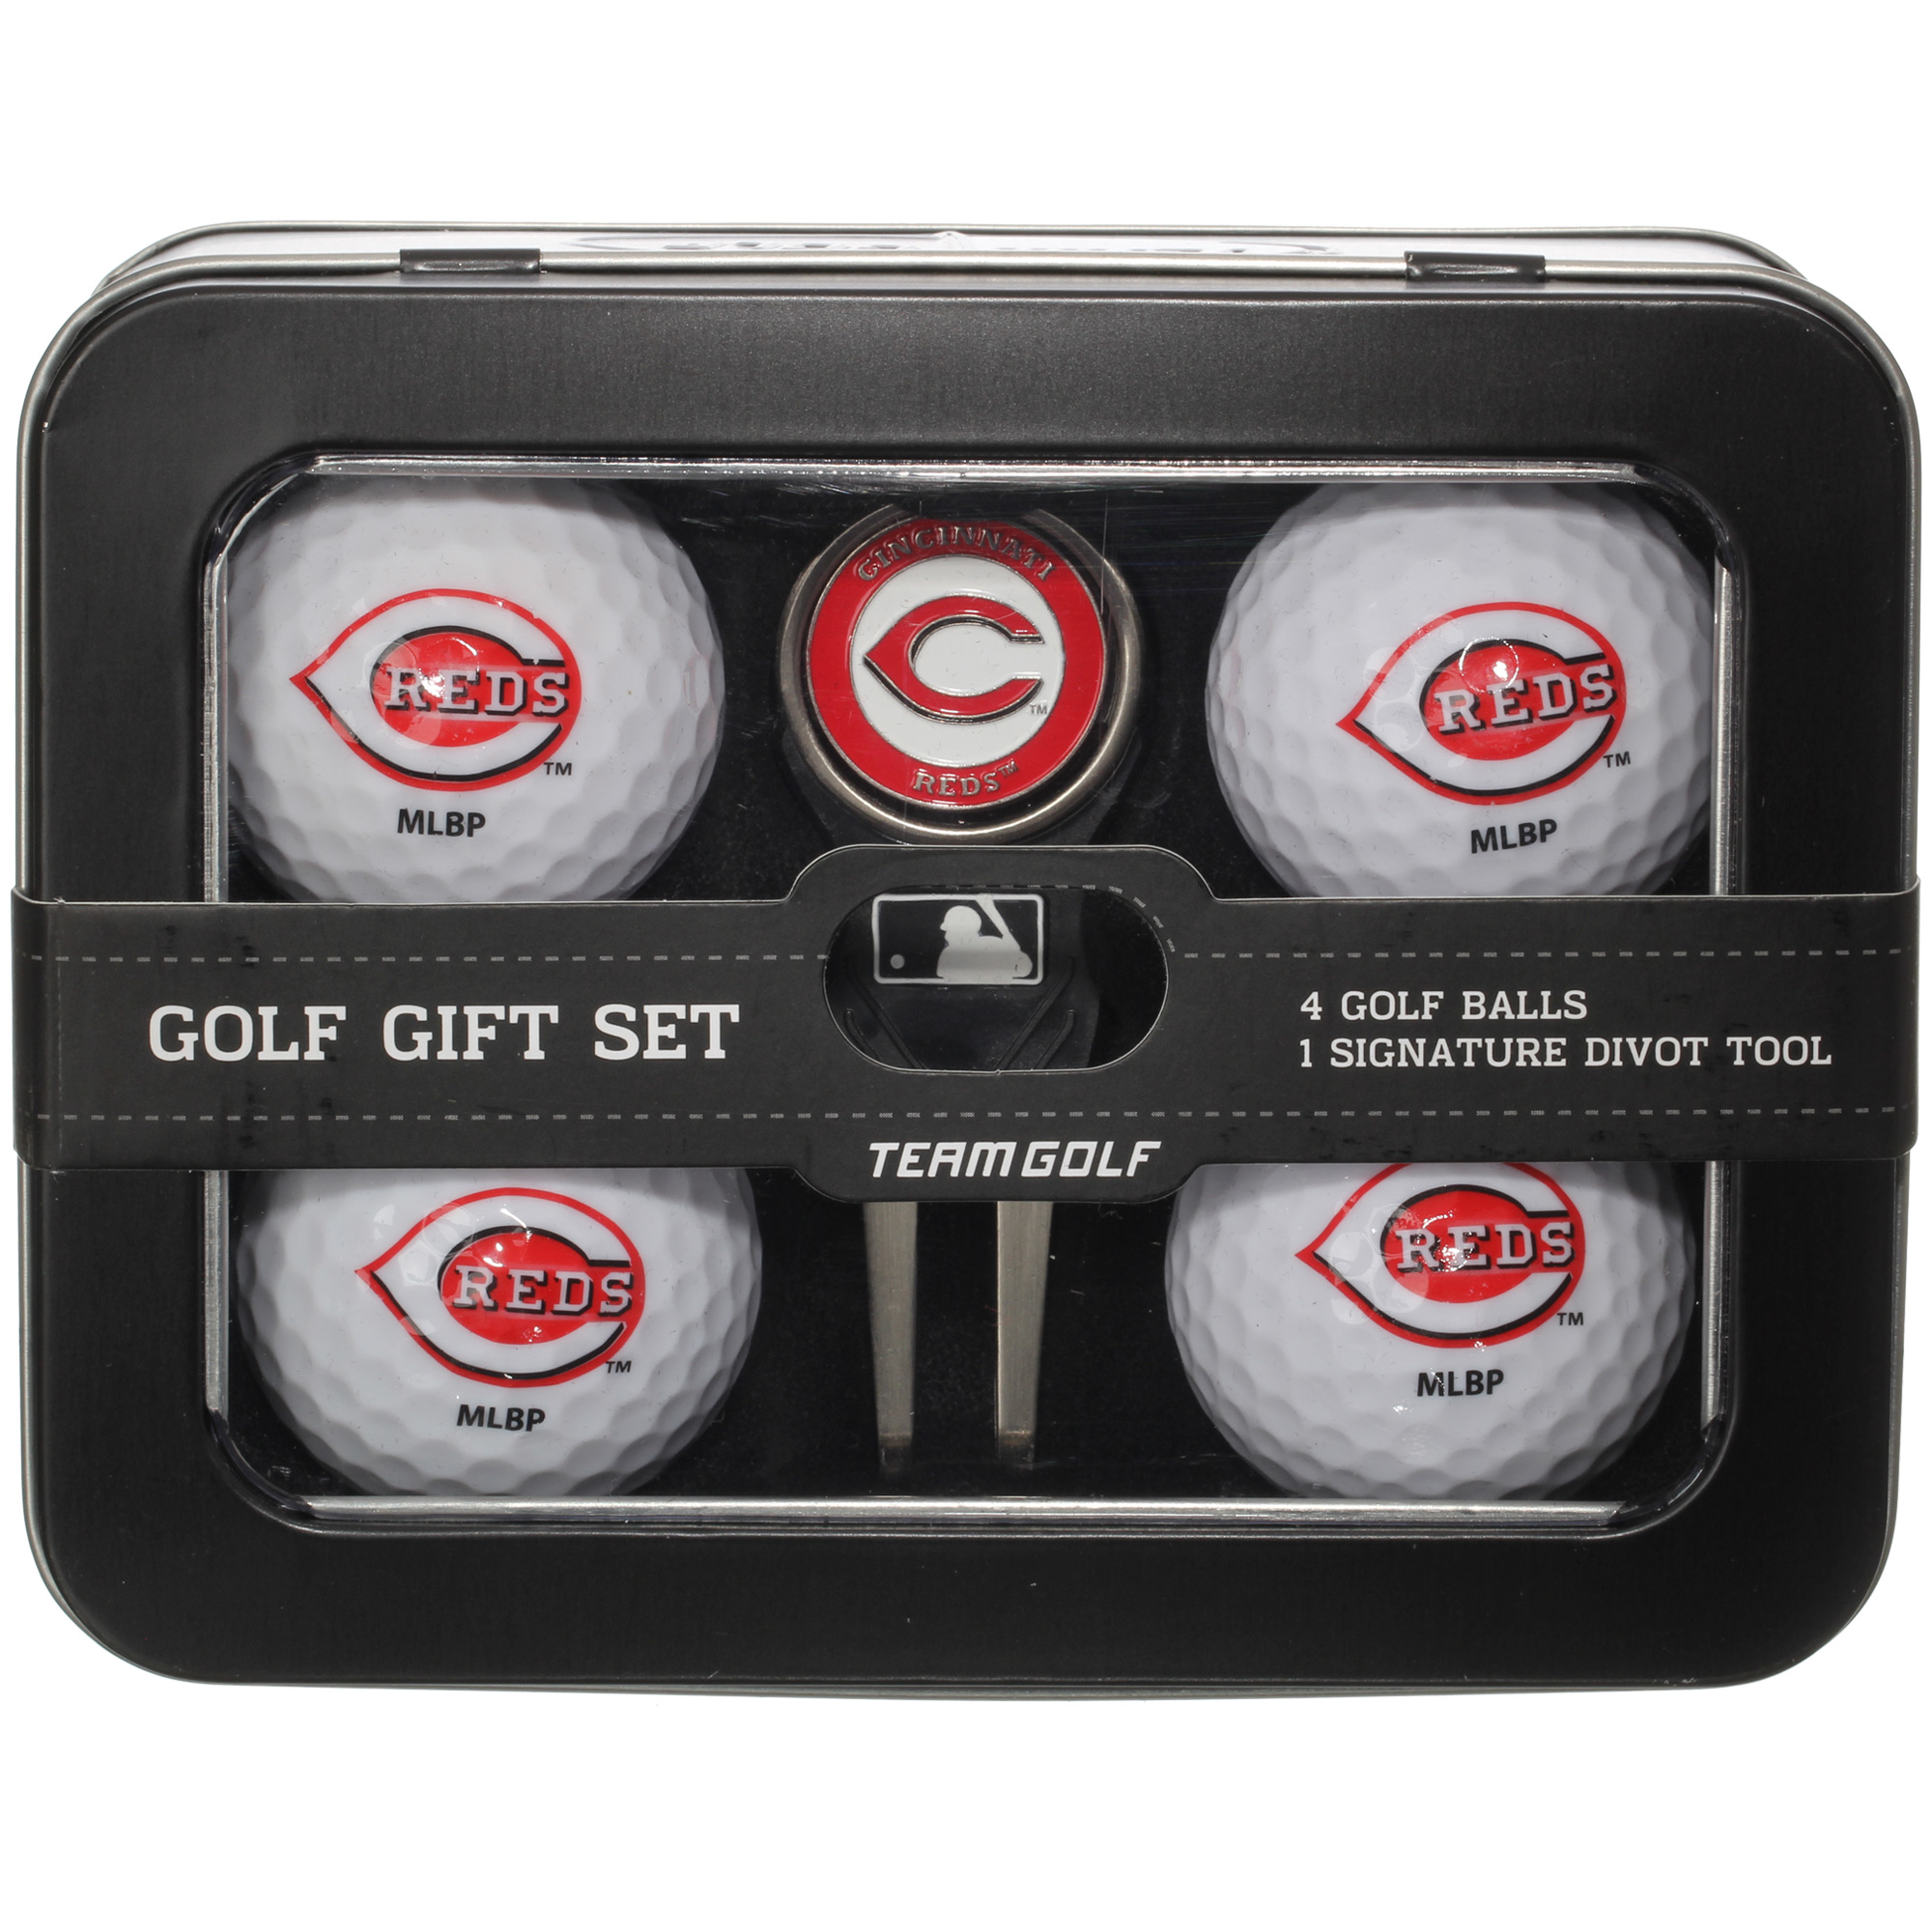 Cincinnati Reds 2016 4 Golf Ball and Divot Tool Set - No Size